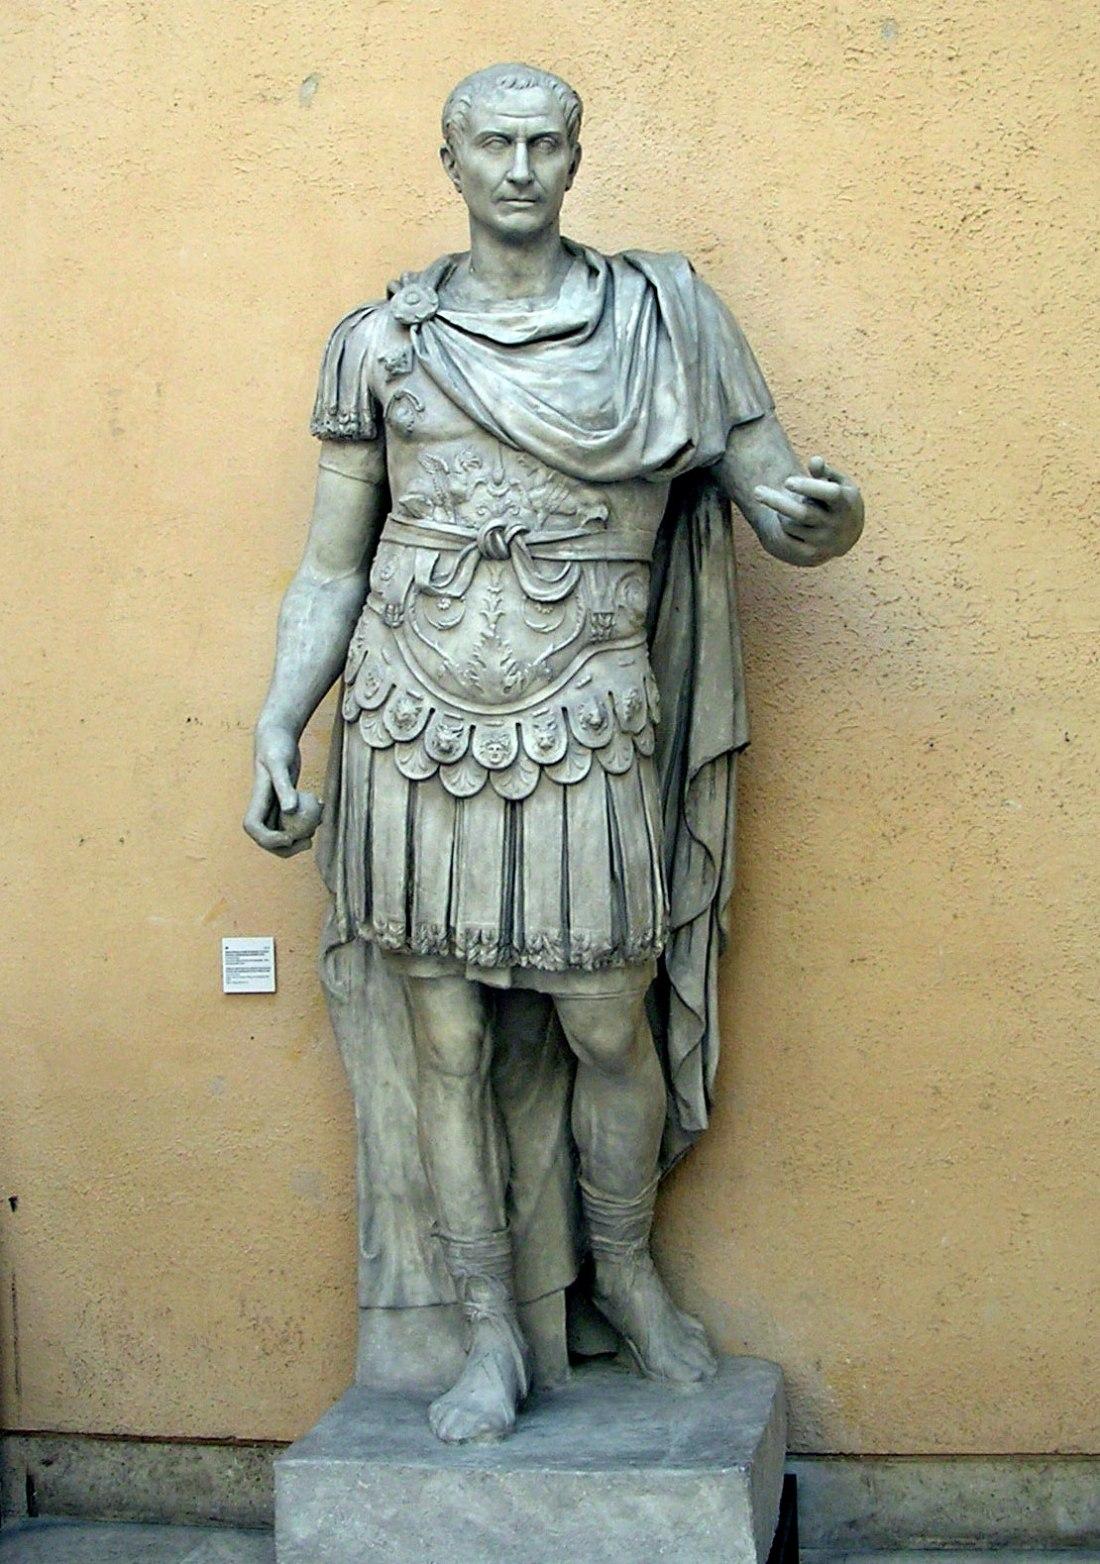 cesar iul099